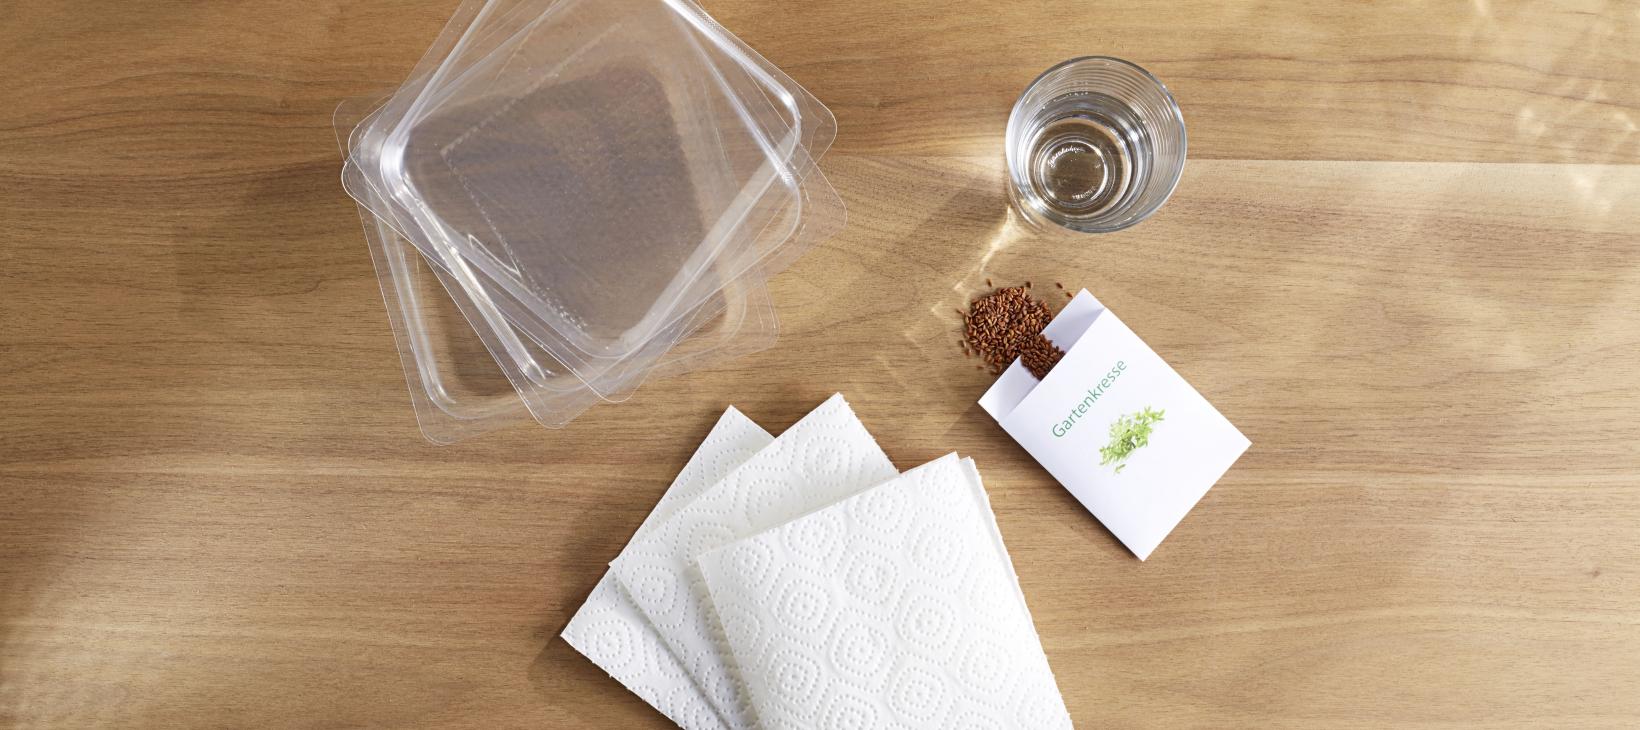 Material Kresse-Tipp: Verpackungen